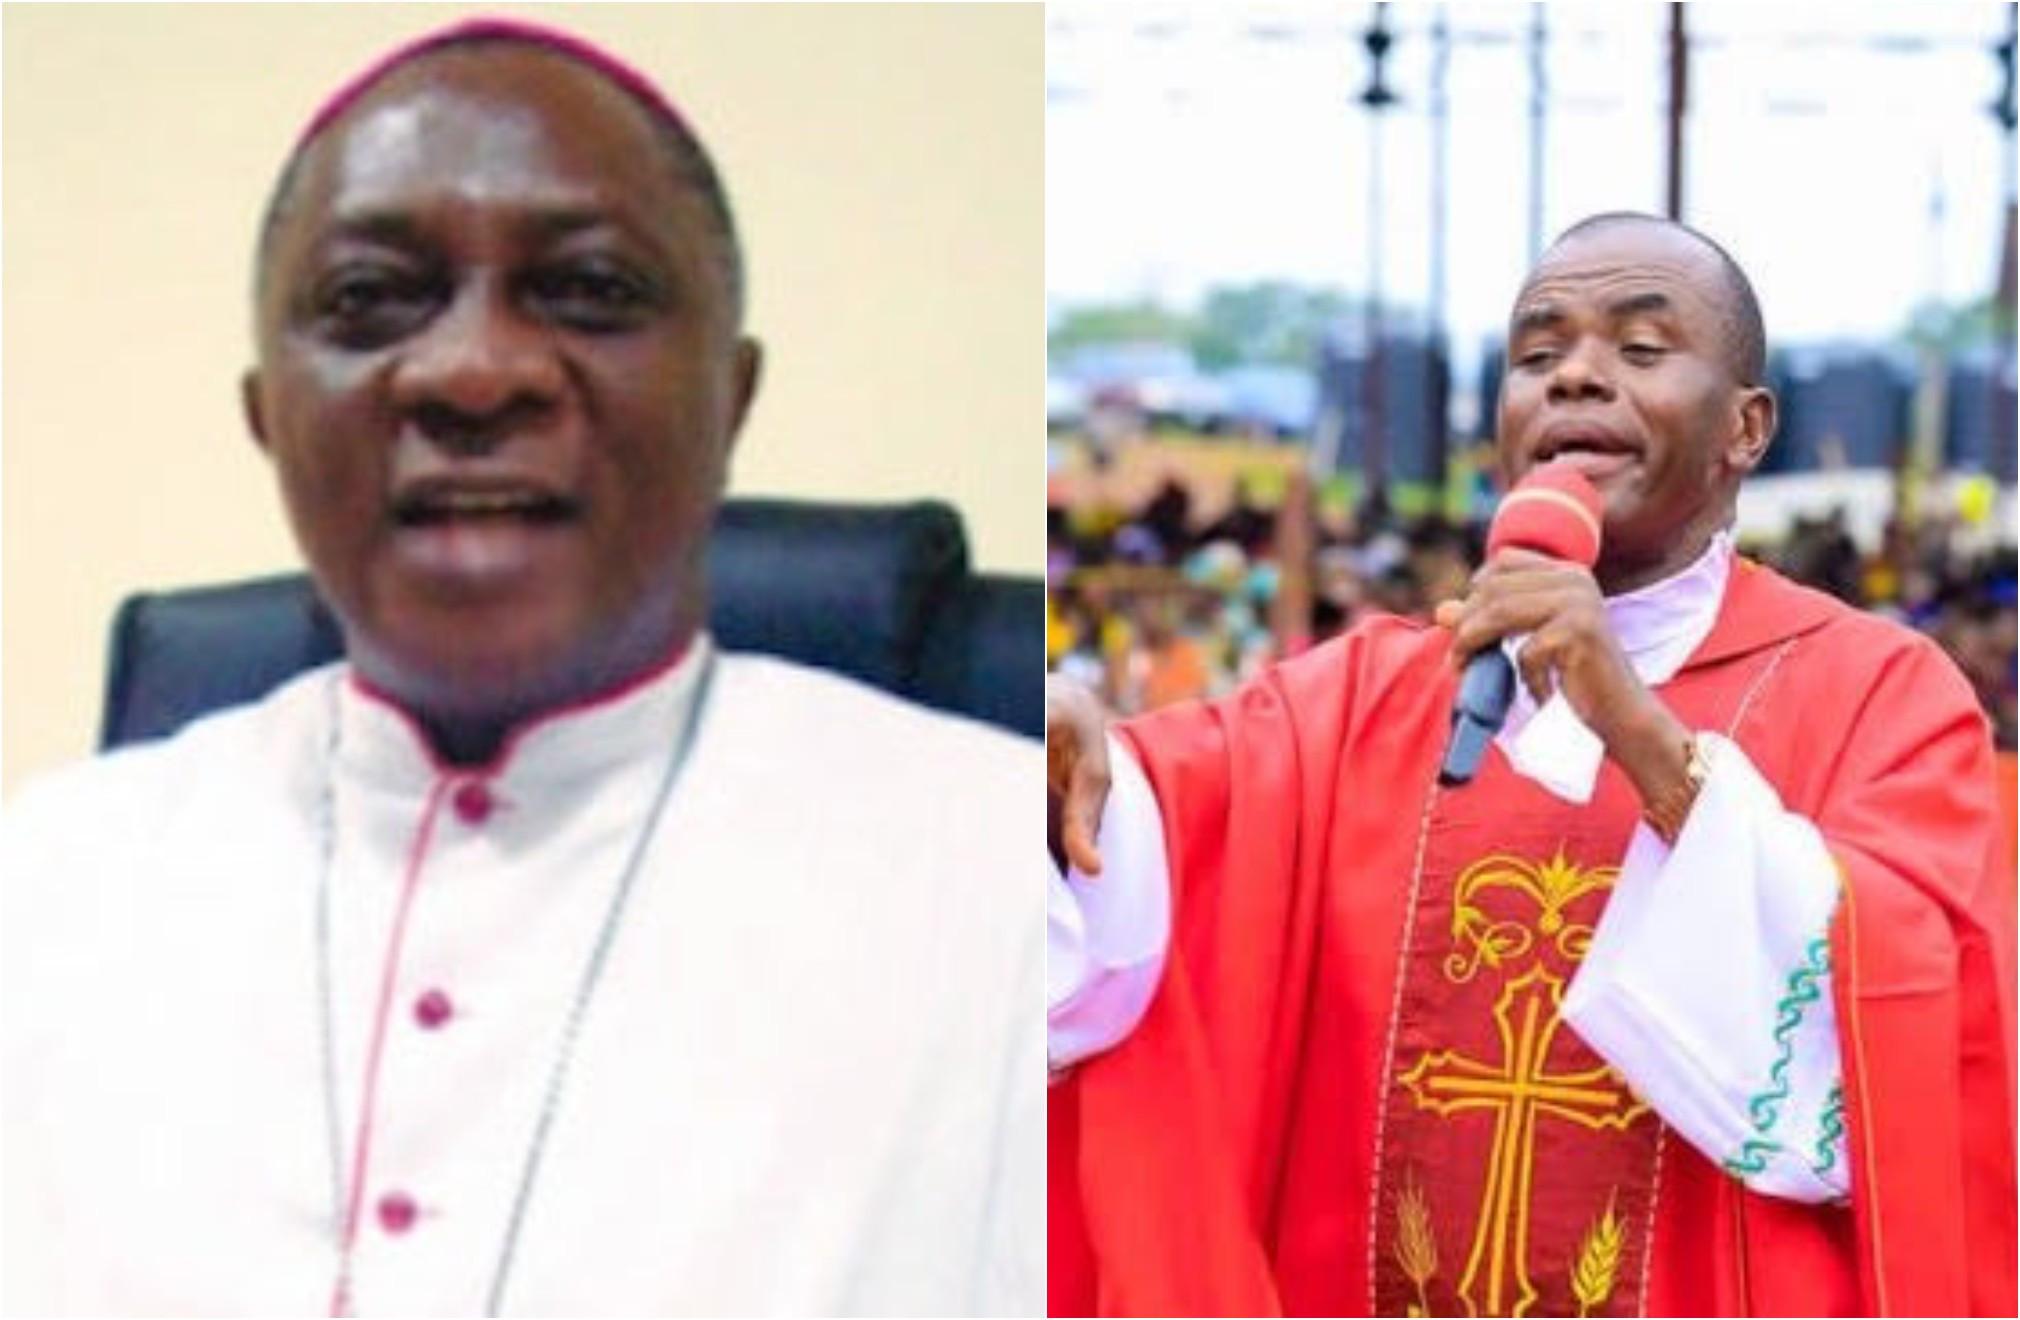 Catholic church may bar Father Mbaka from preaching ? Archbishop Adewale Martins